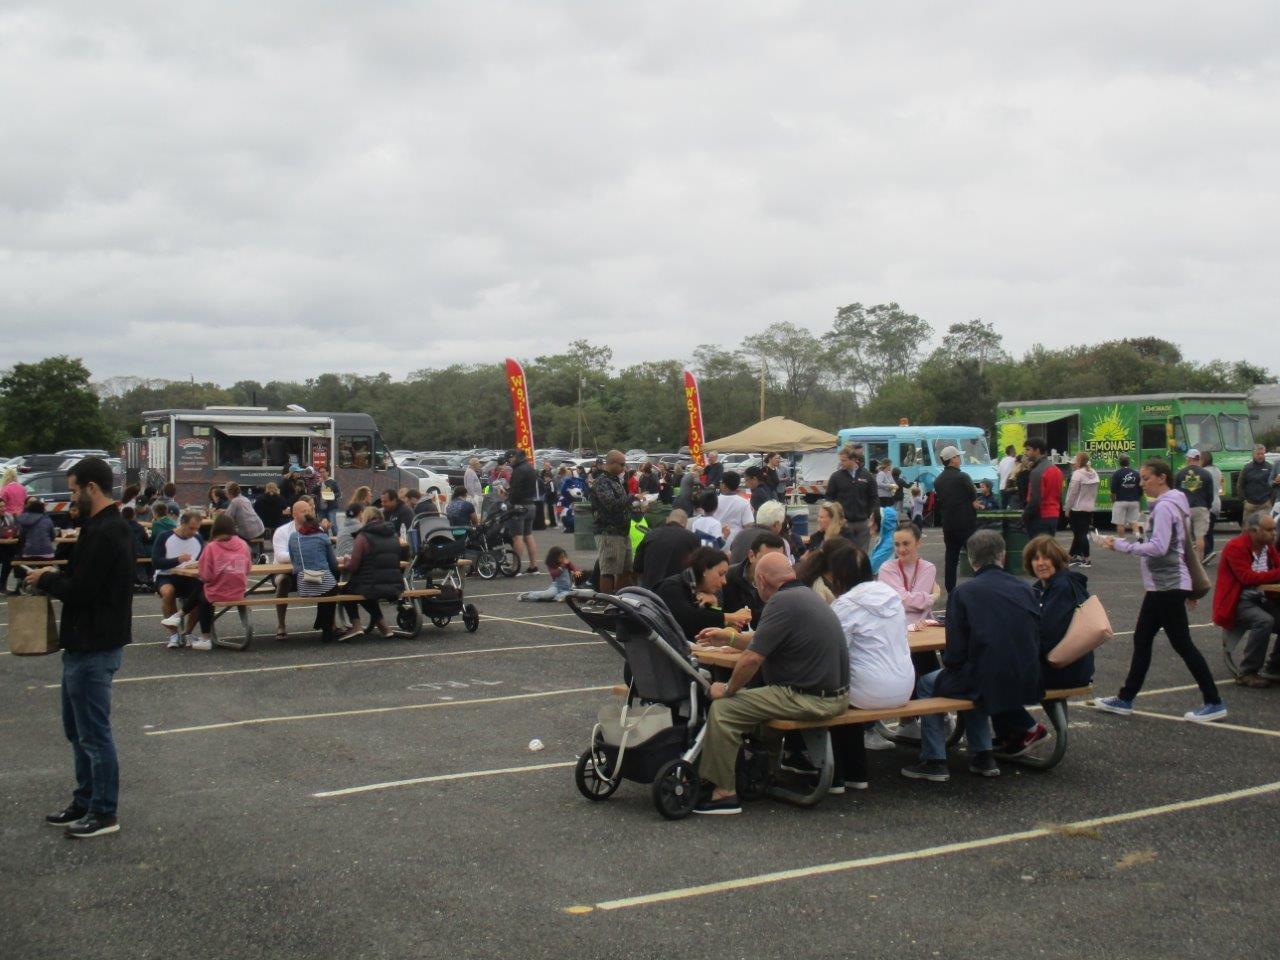 Fairfield Food Truck Fest 10/6/19